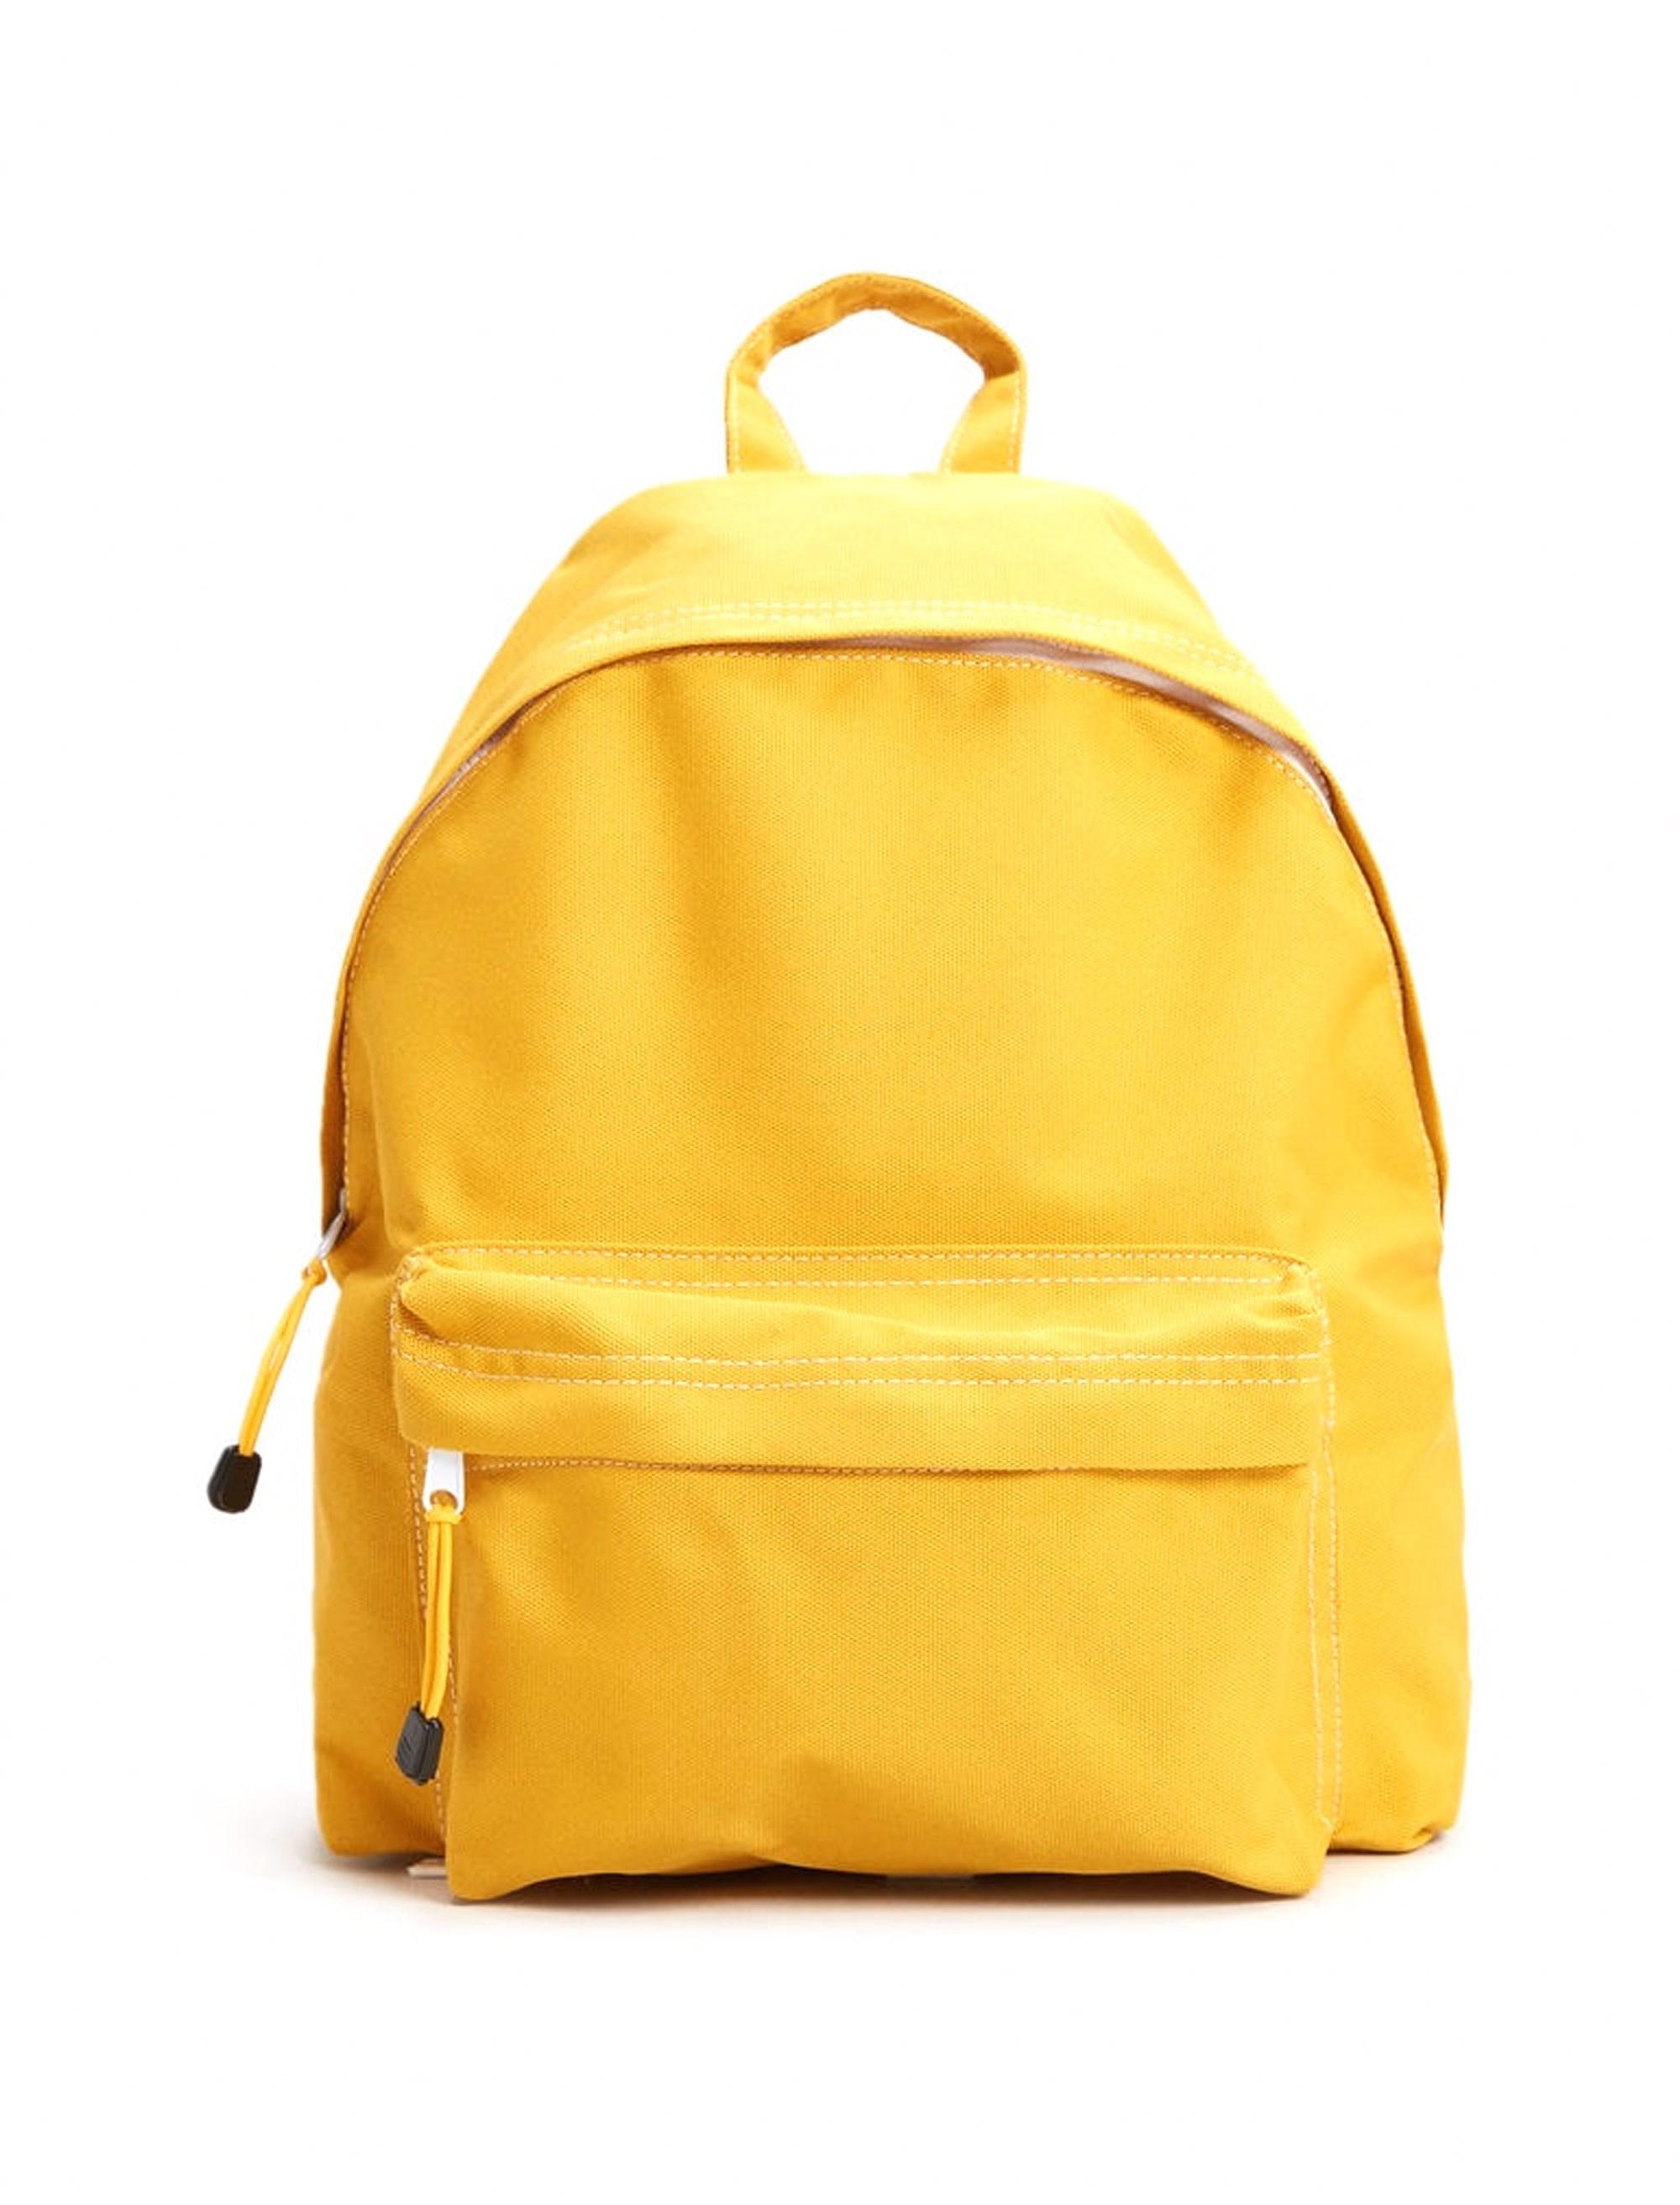 کوله پشتی روزمره مردانه - زرد - 1